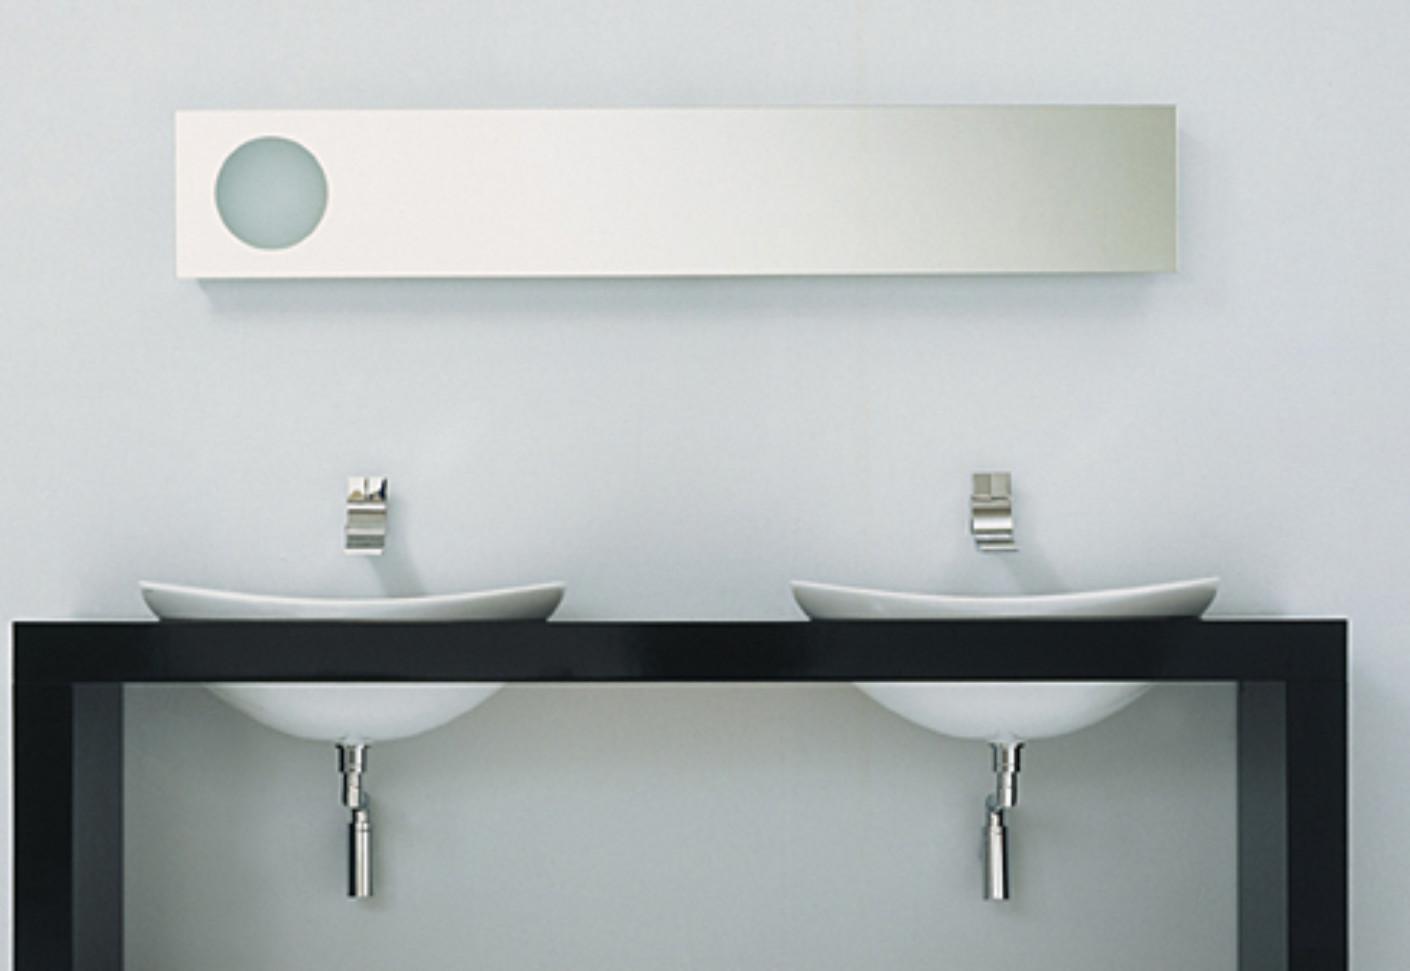 SI wall mounted bath mixer by Ceramica Flaminia | STYLEPARK